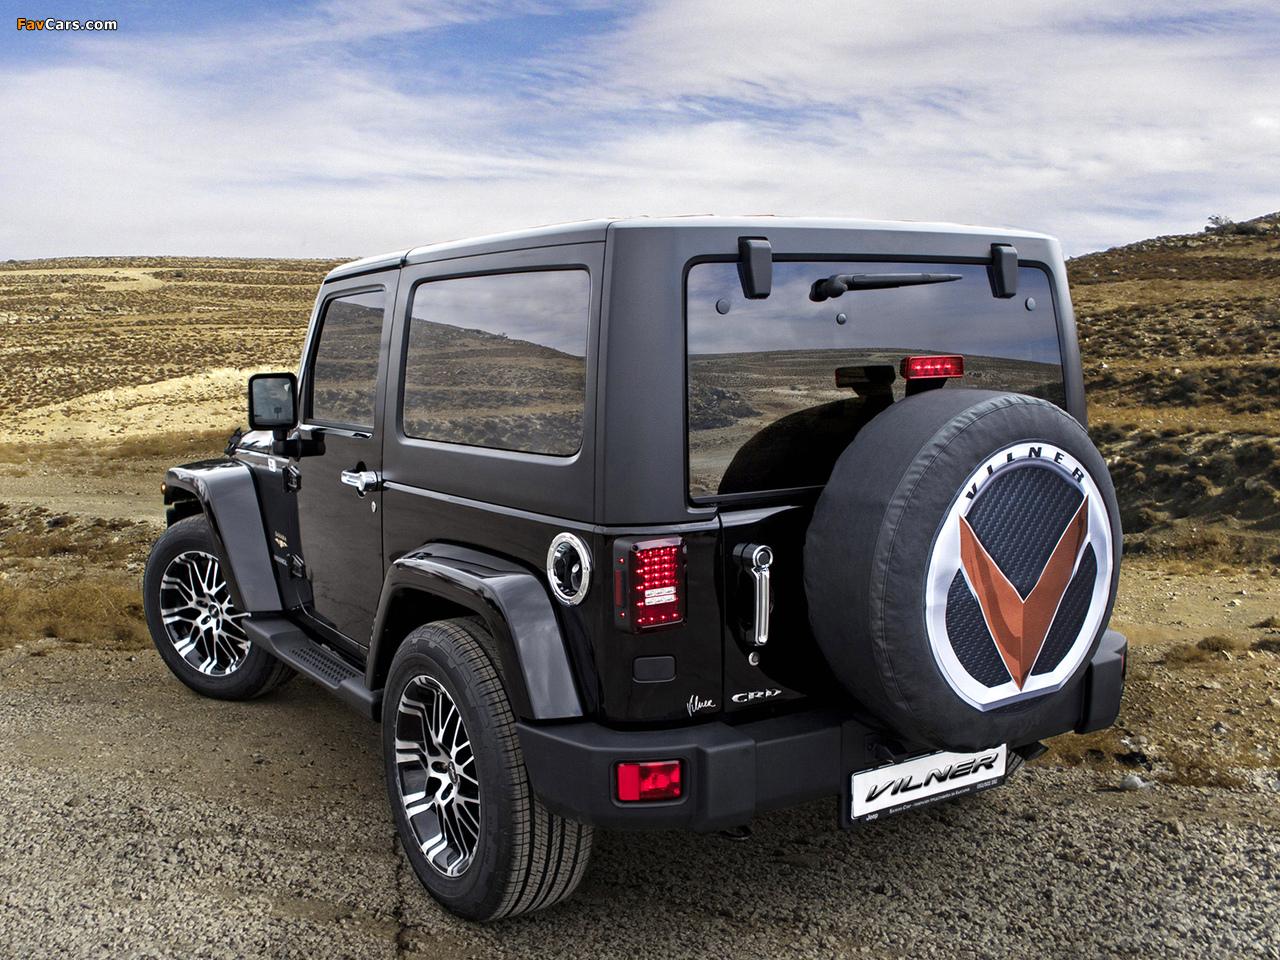 Vilner Studio Jeep Wrangler (JK) 2012 images (1280 x 960)